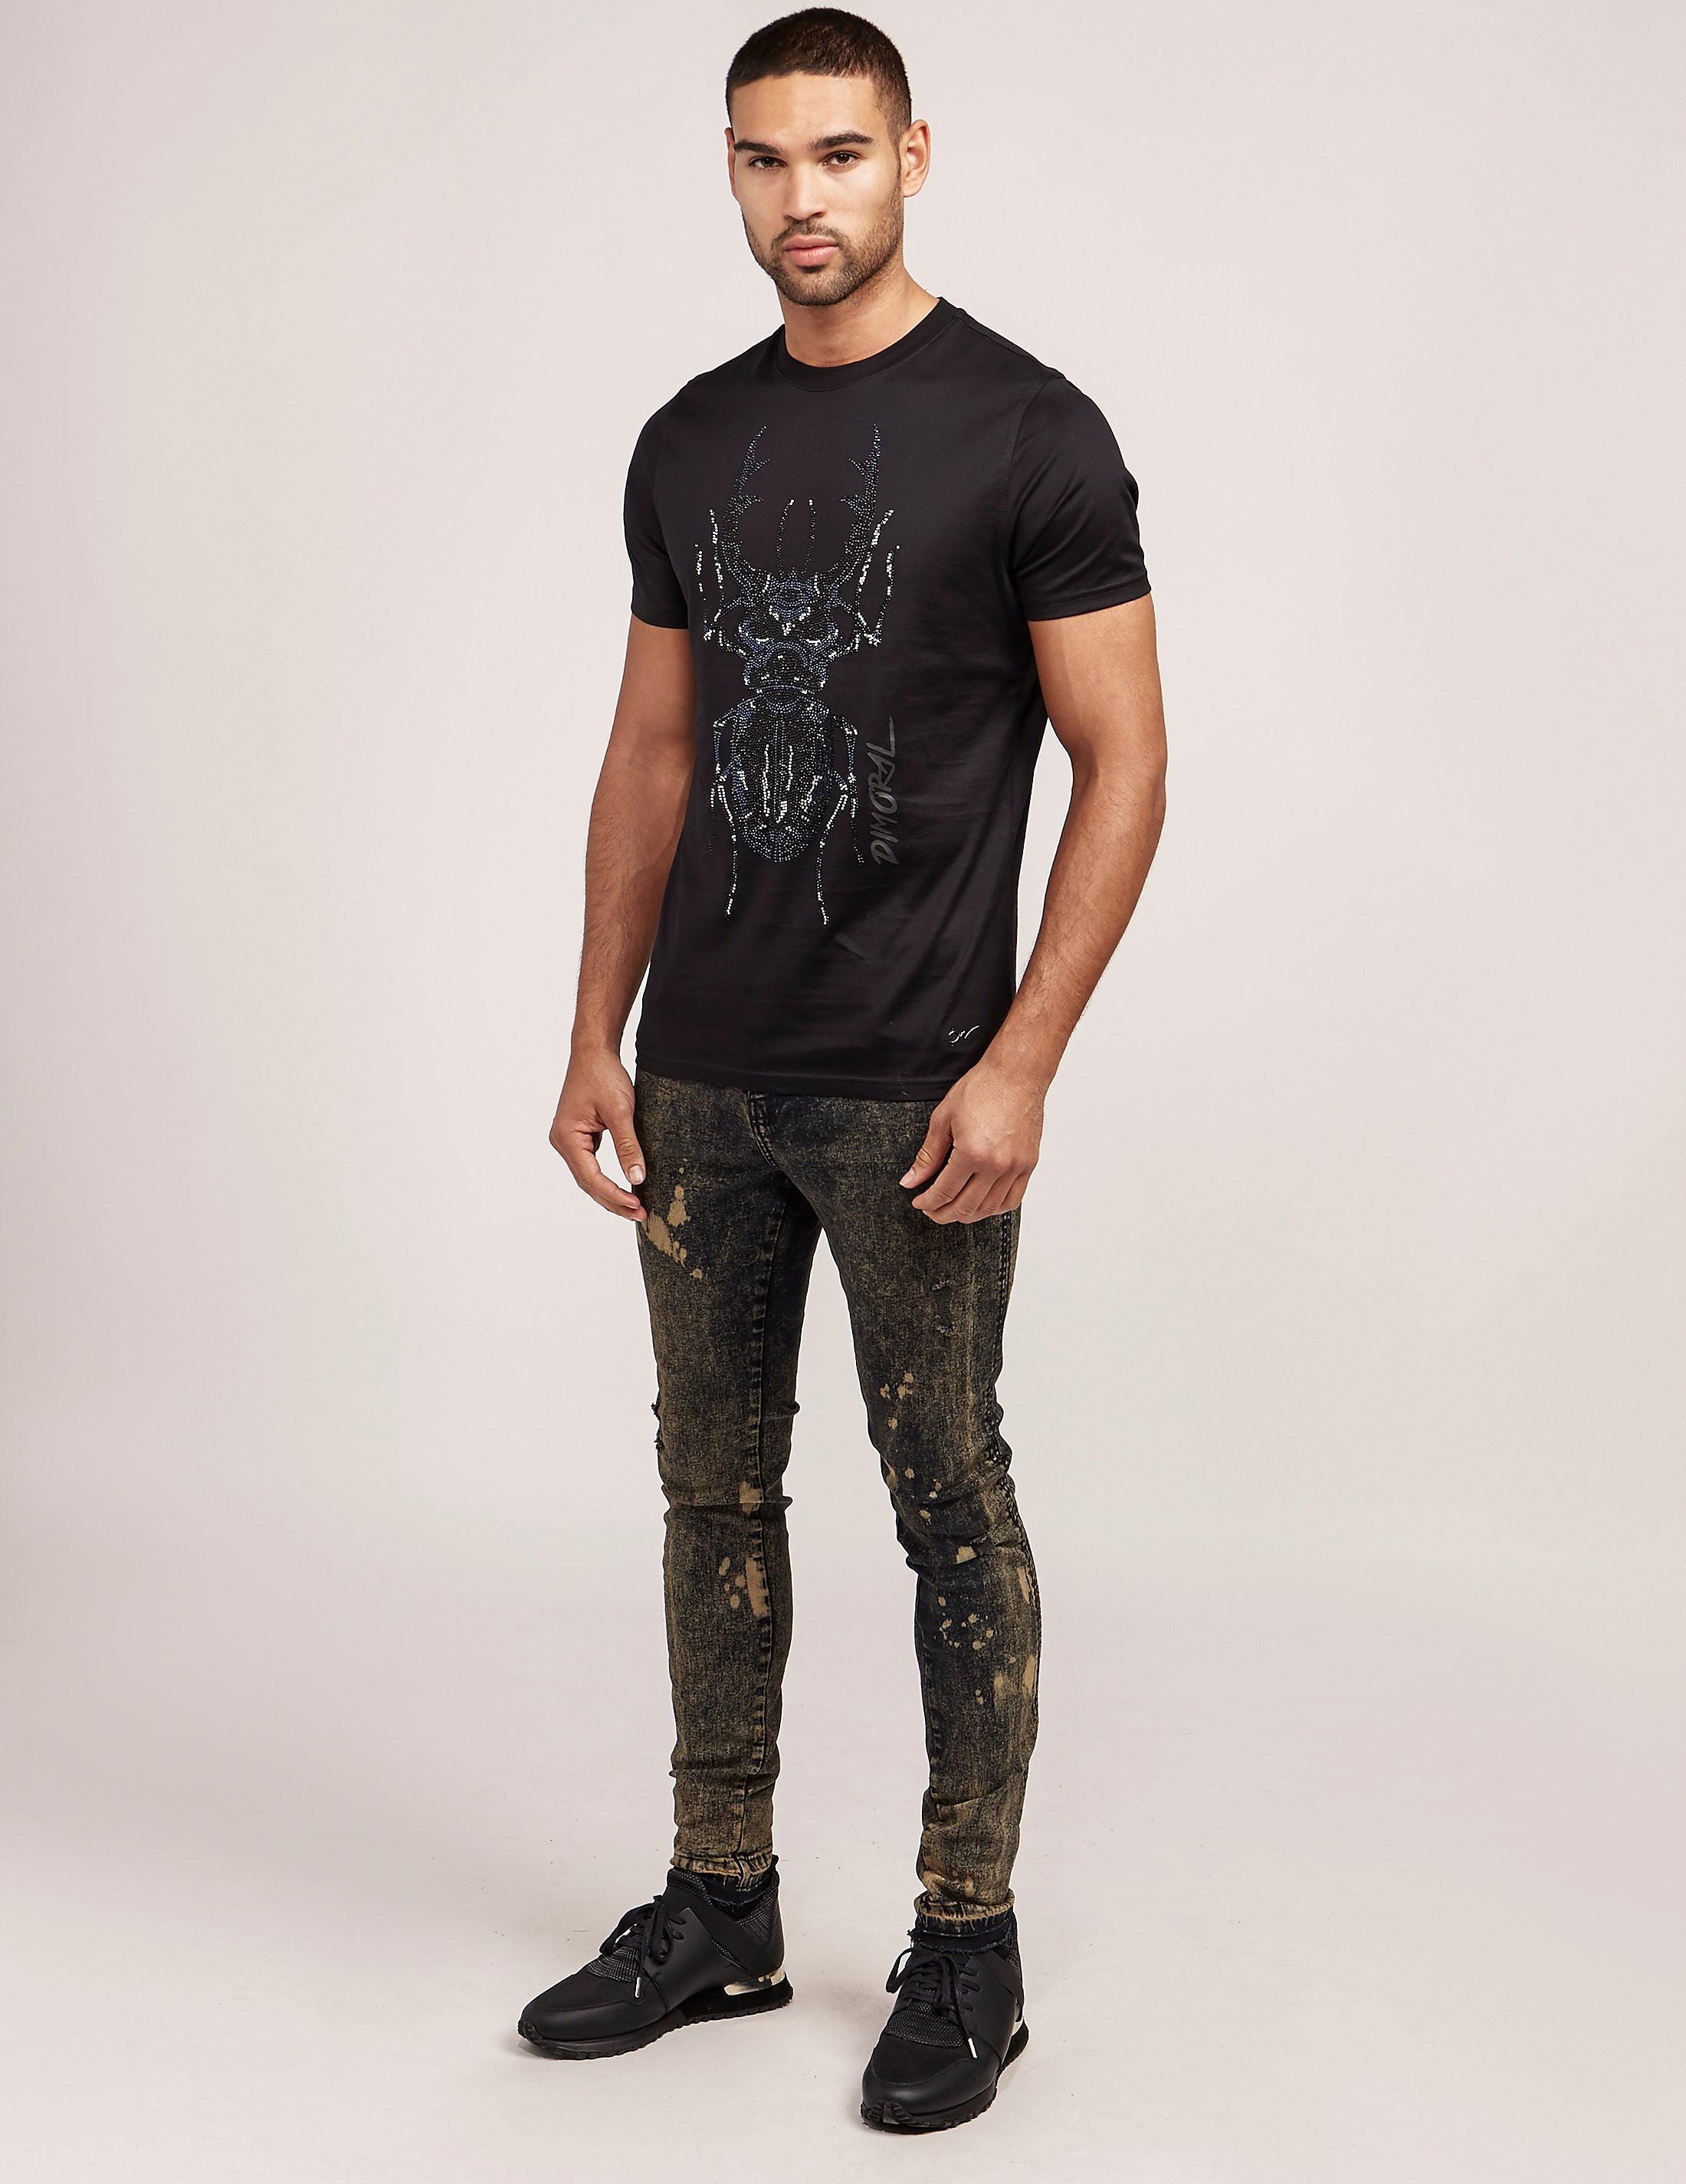 Dimoral Beetle Short Sleeve T-Shirt